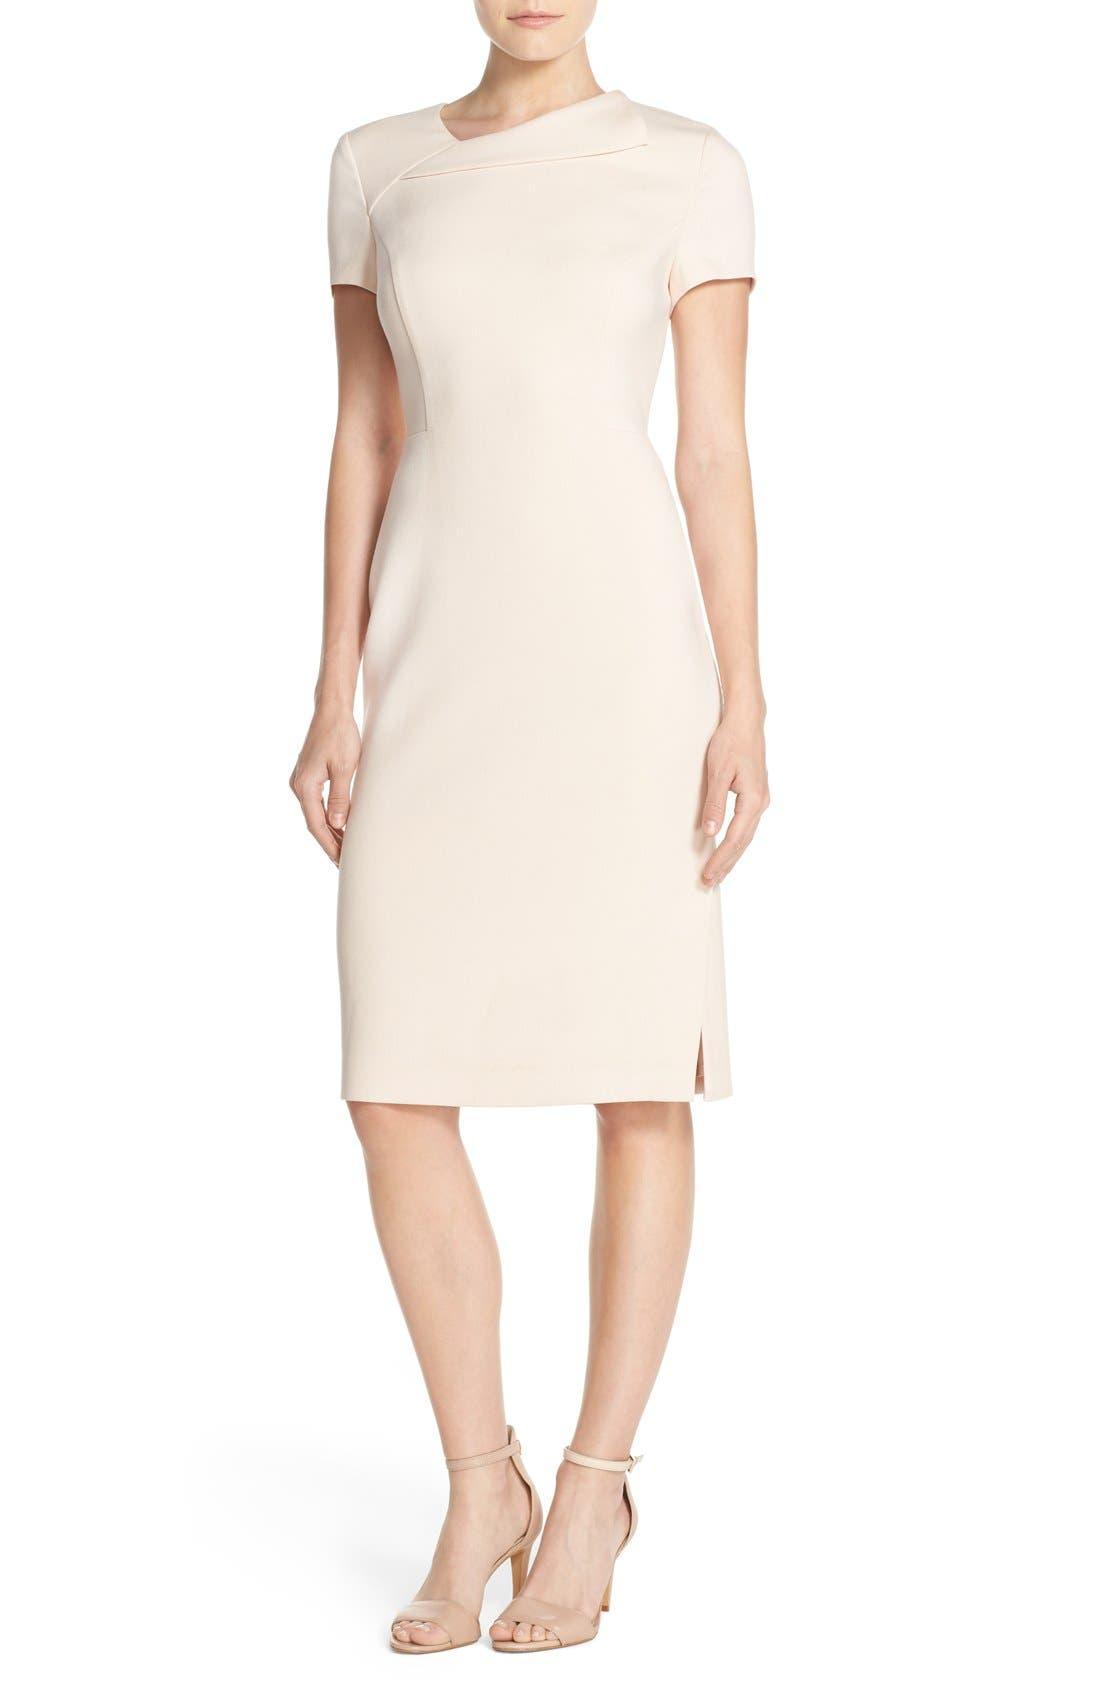 Alternate Image 1 Selected - Vince Camuto Asymmetrical Crepe Sheath Dress (Regular & Petite)